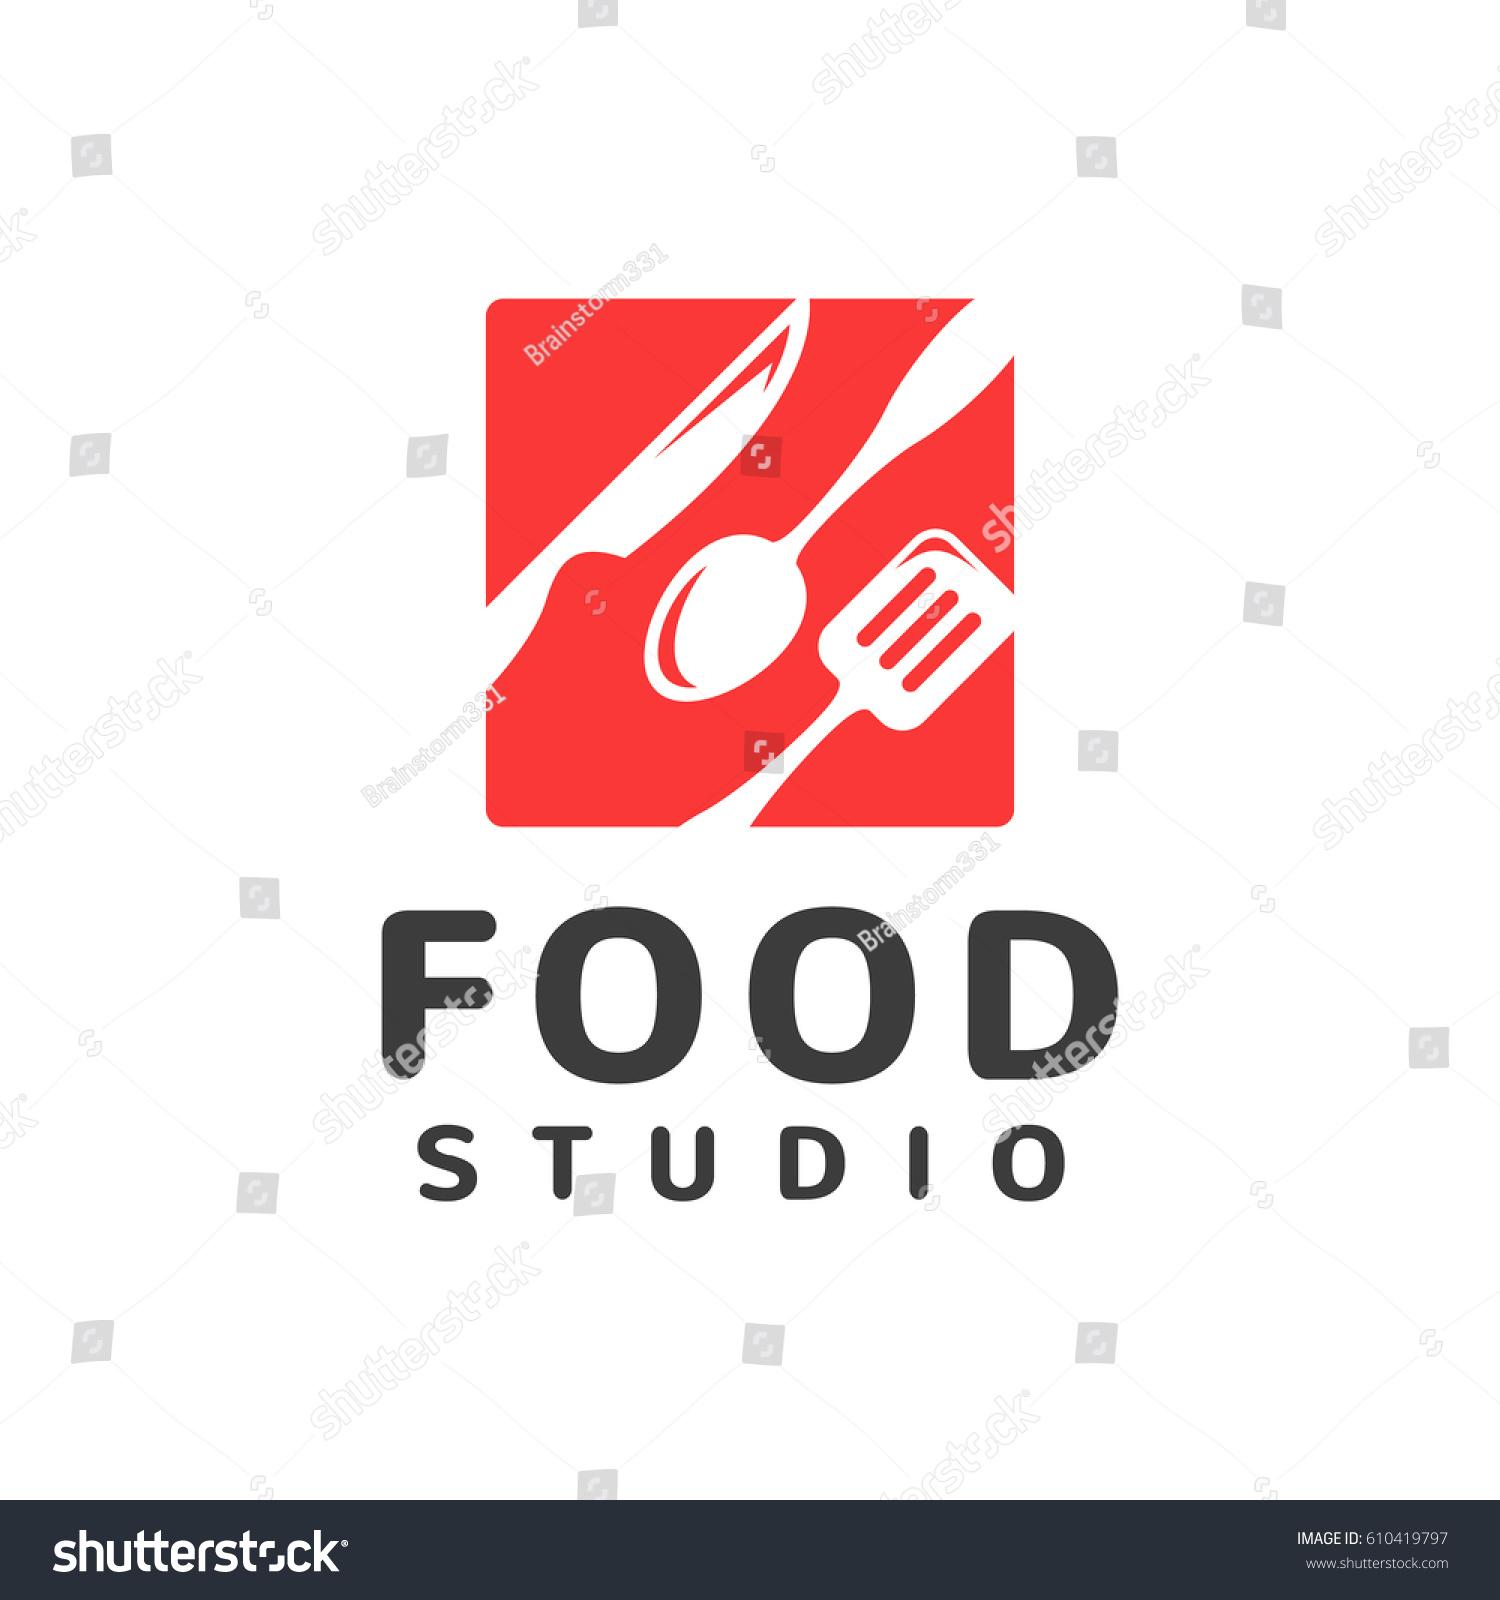 Food studio vector logo kitchen tools stock